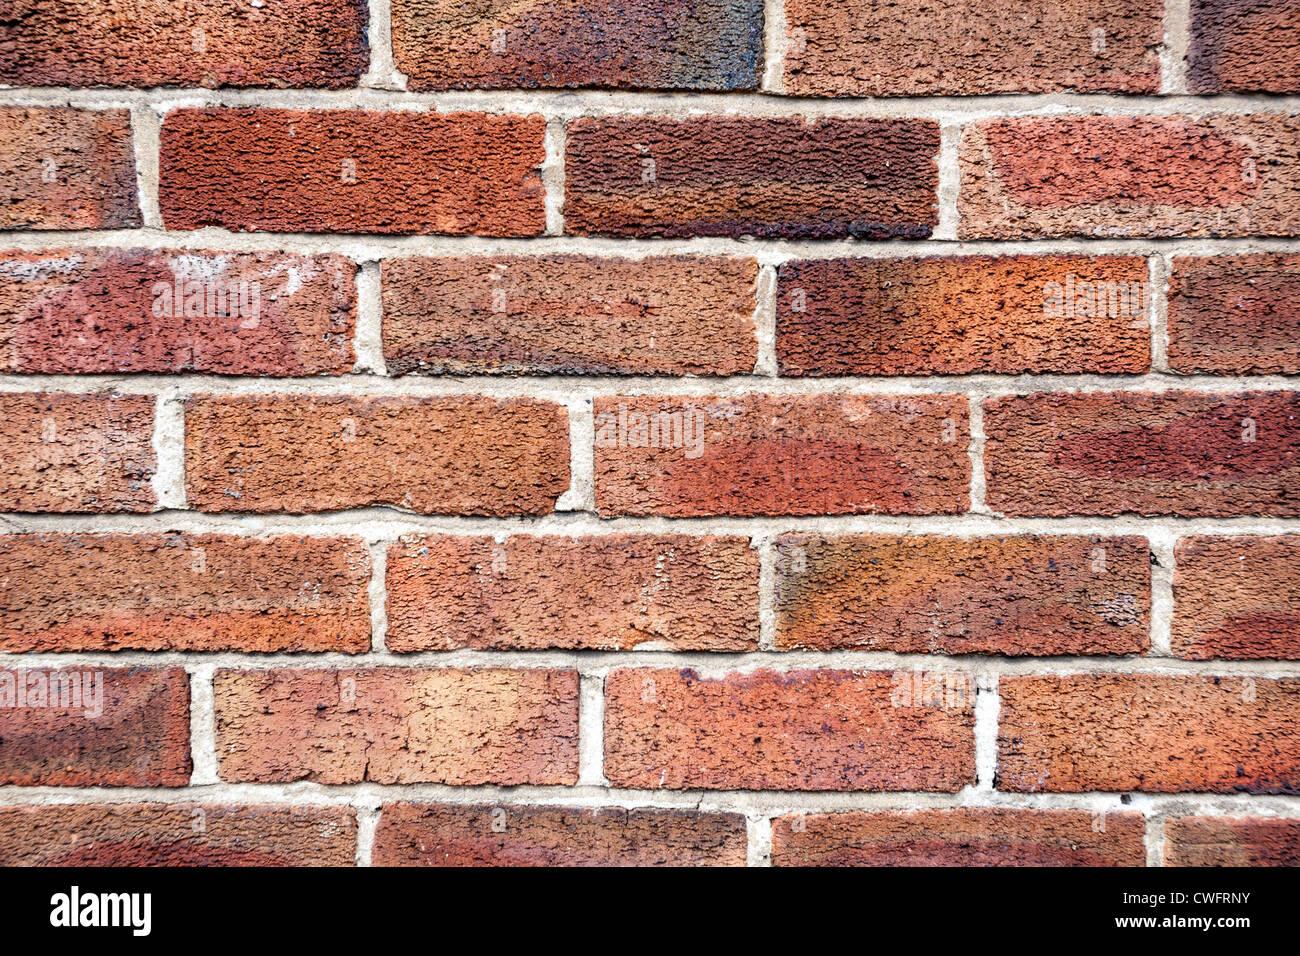 Red brick wall. - Stock Image